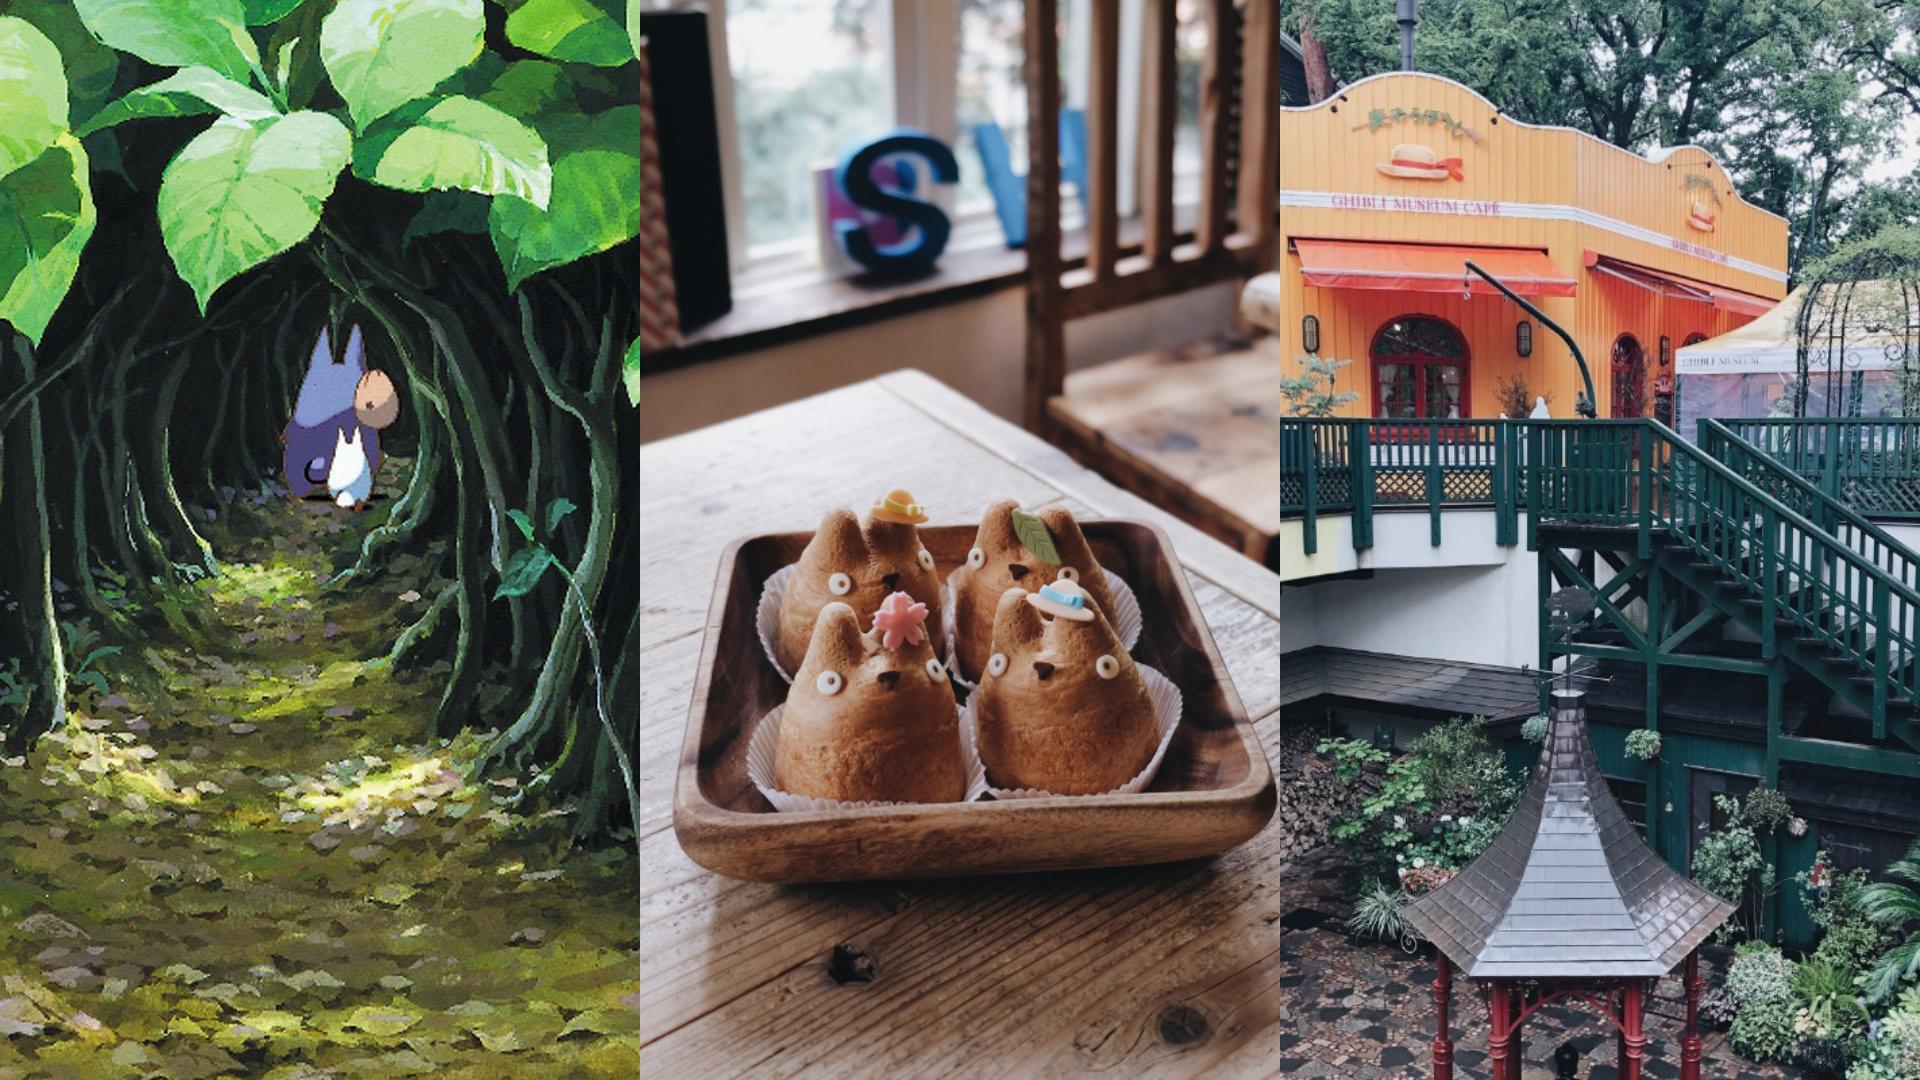 Mysterious Japan Ghibli Museum Offers A Sneak Peek Inside Its Whimsical Walls